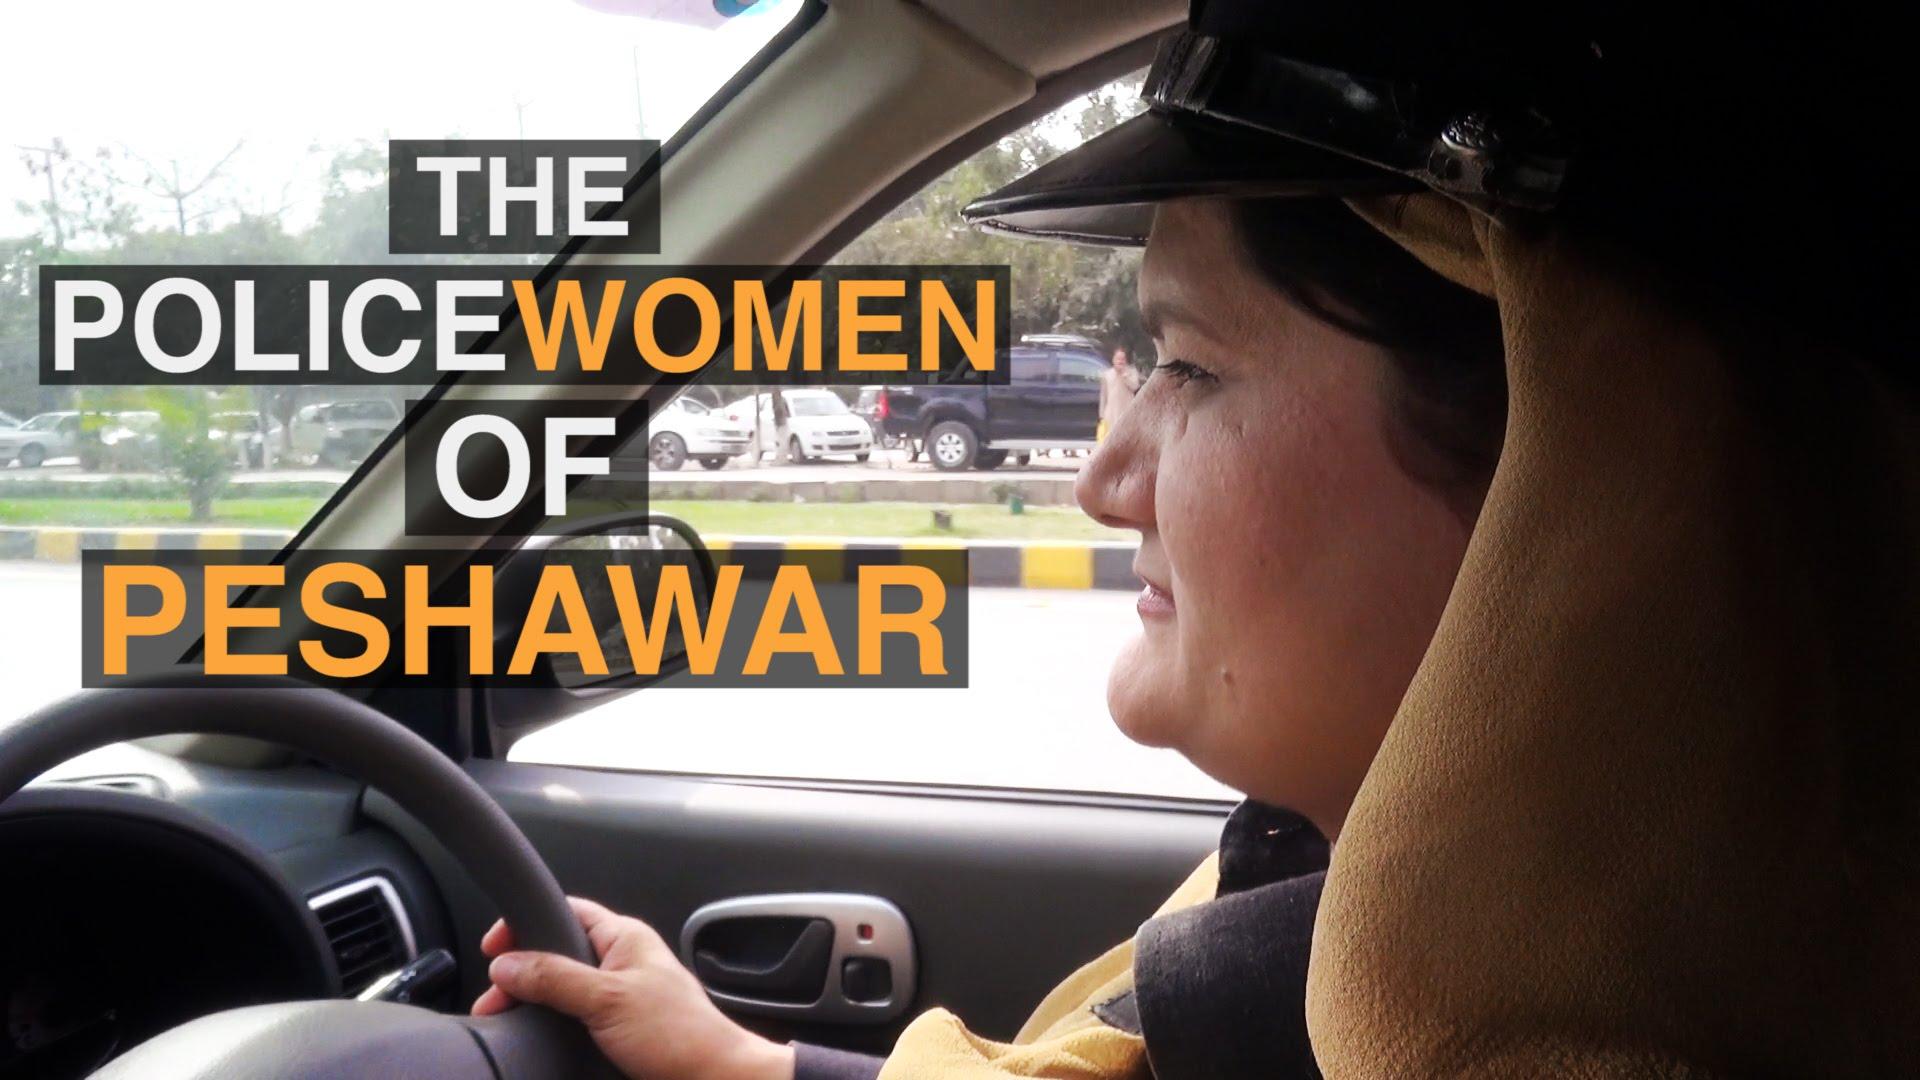 The Policewomen of Peshawar